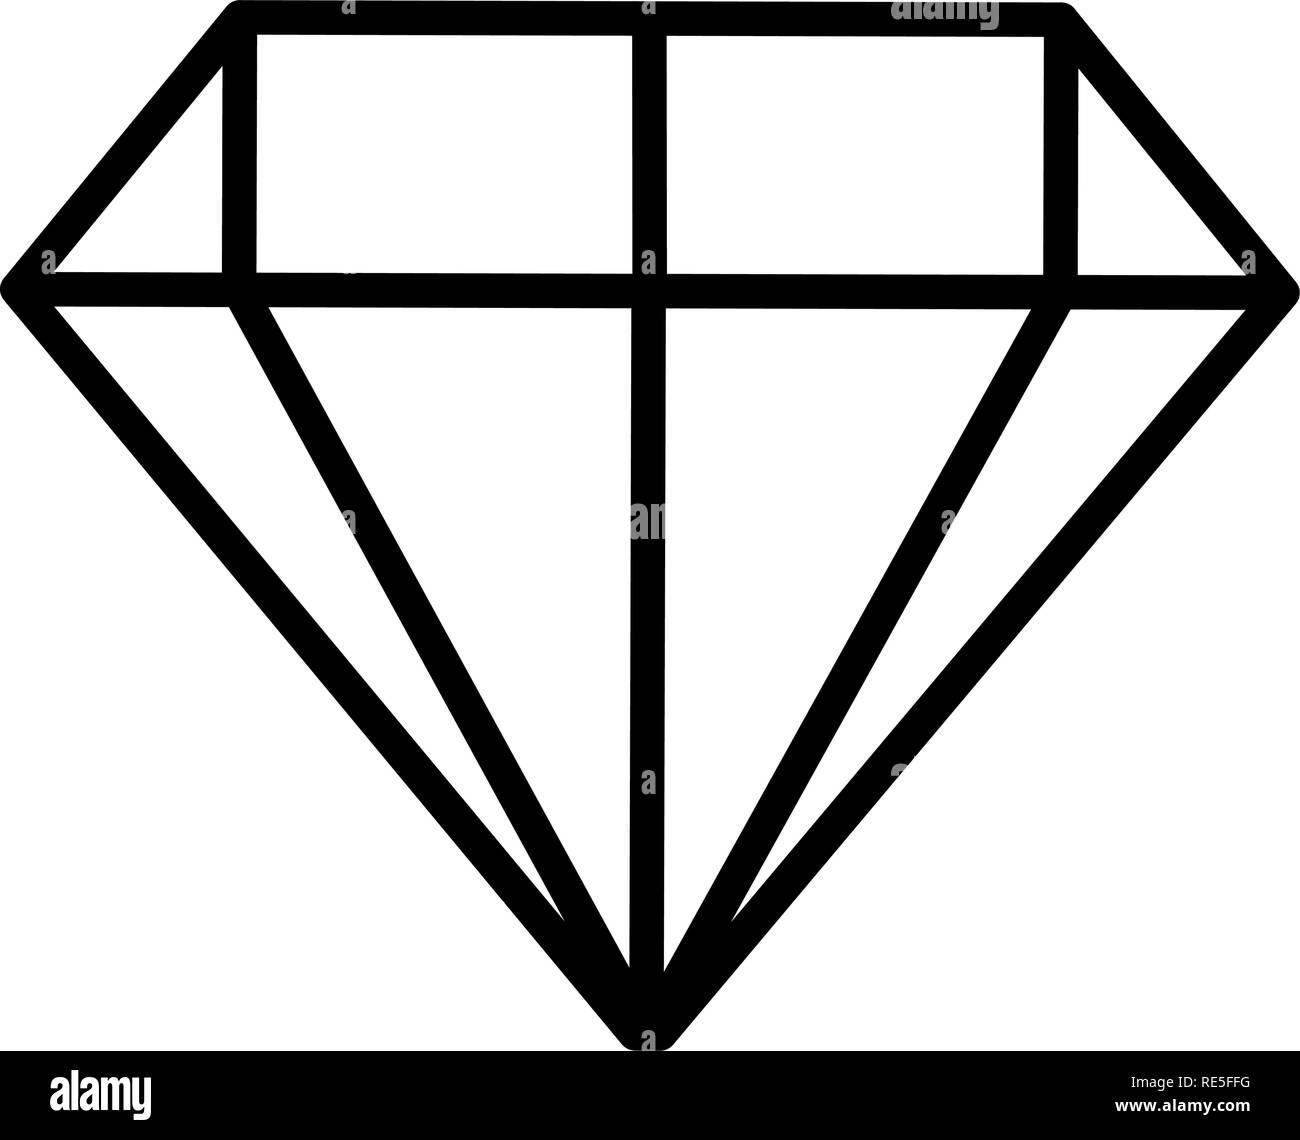 diamond luxury isolated icon vector illustration design - Stock Image